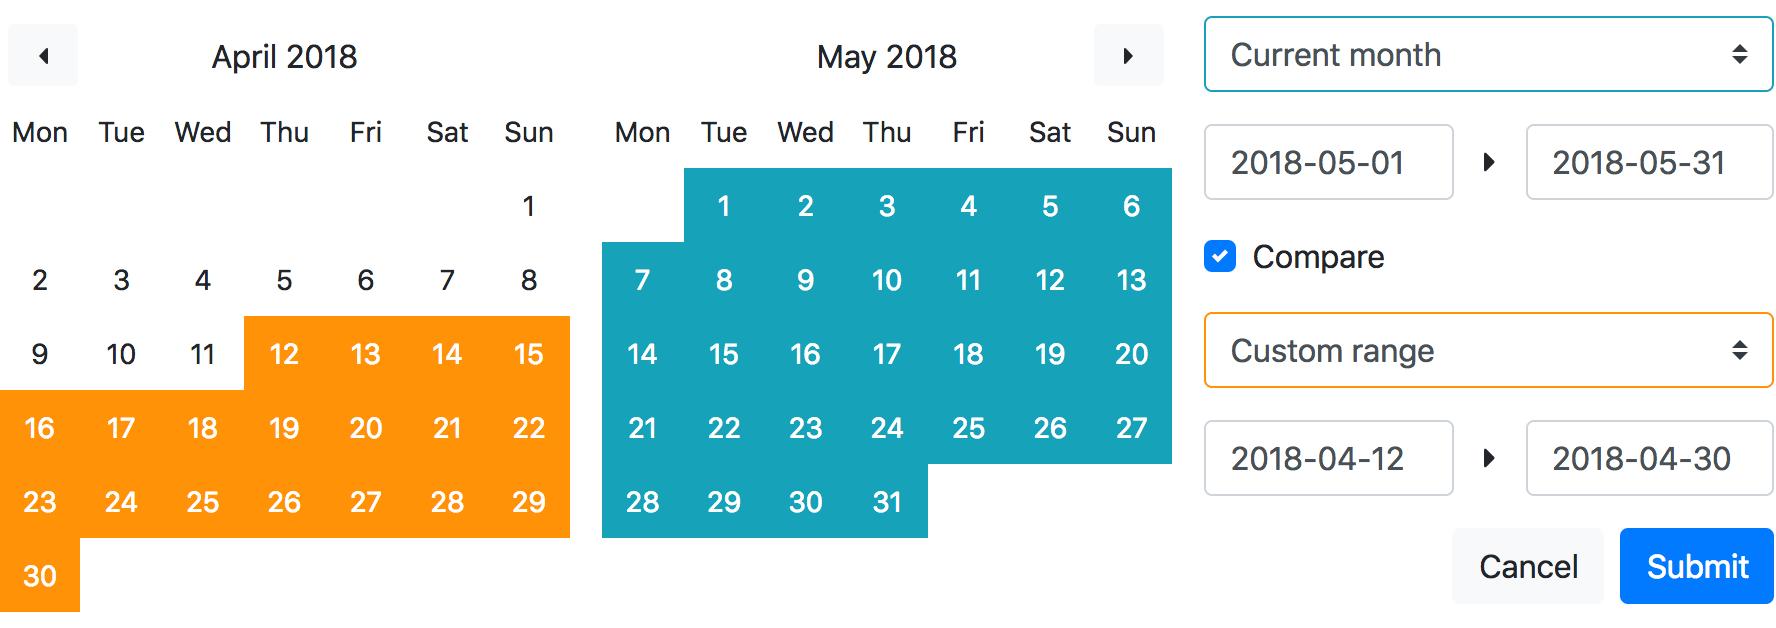 Bootstrap 4 Date Range Picker For Vue js - Vue js Script